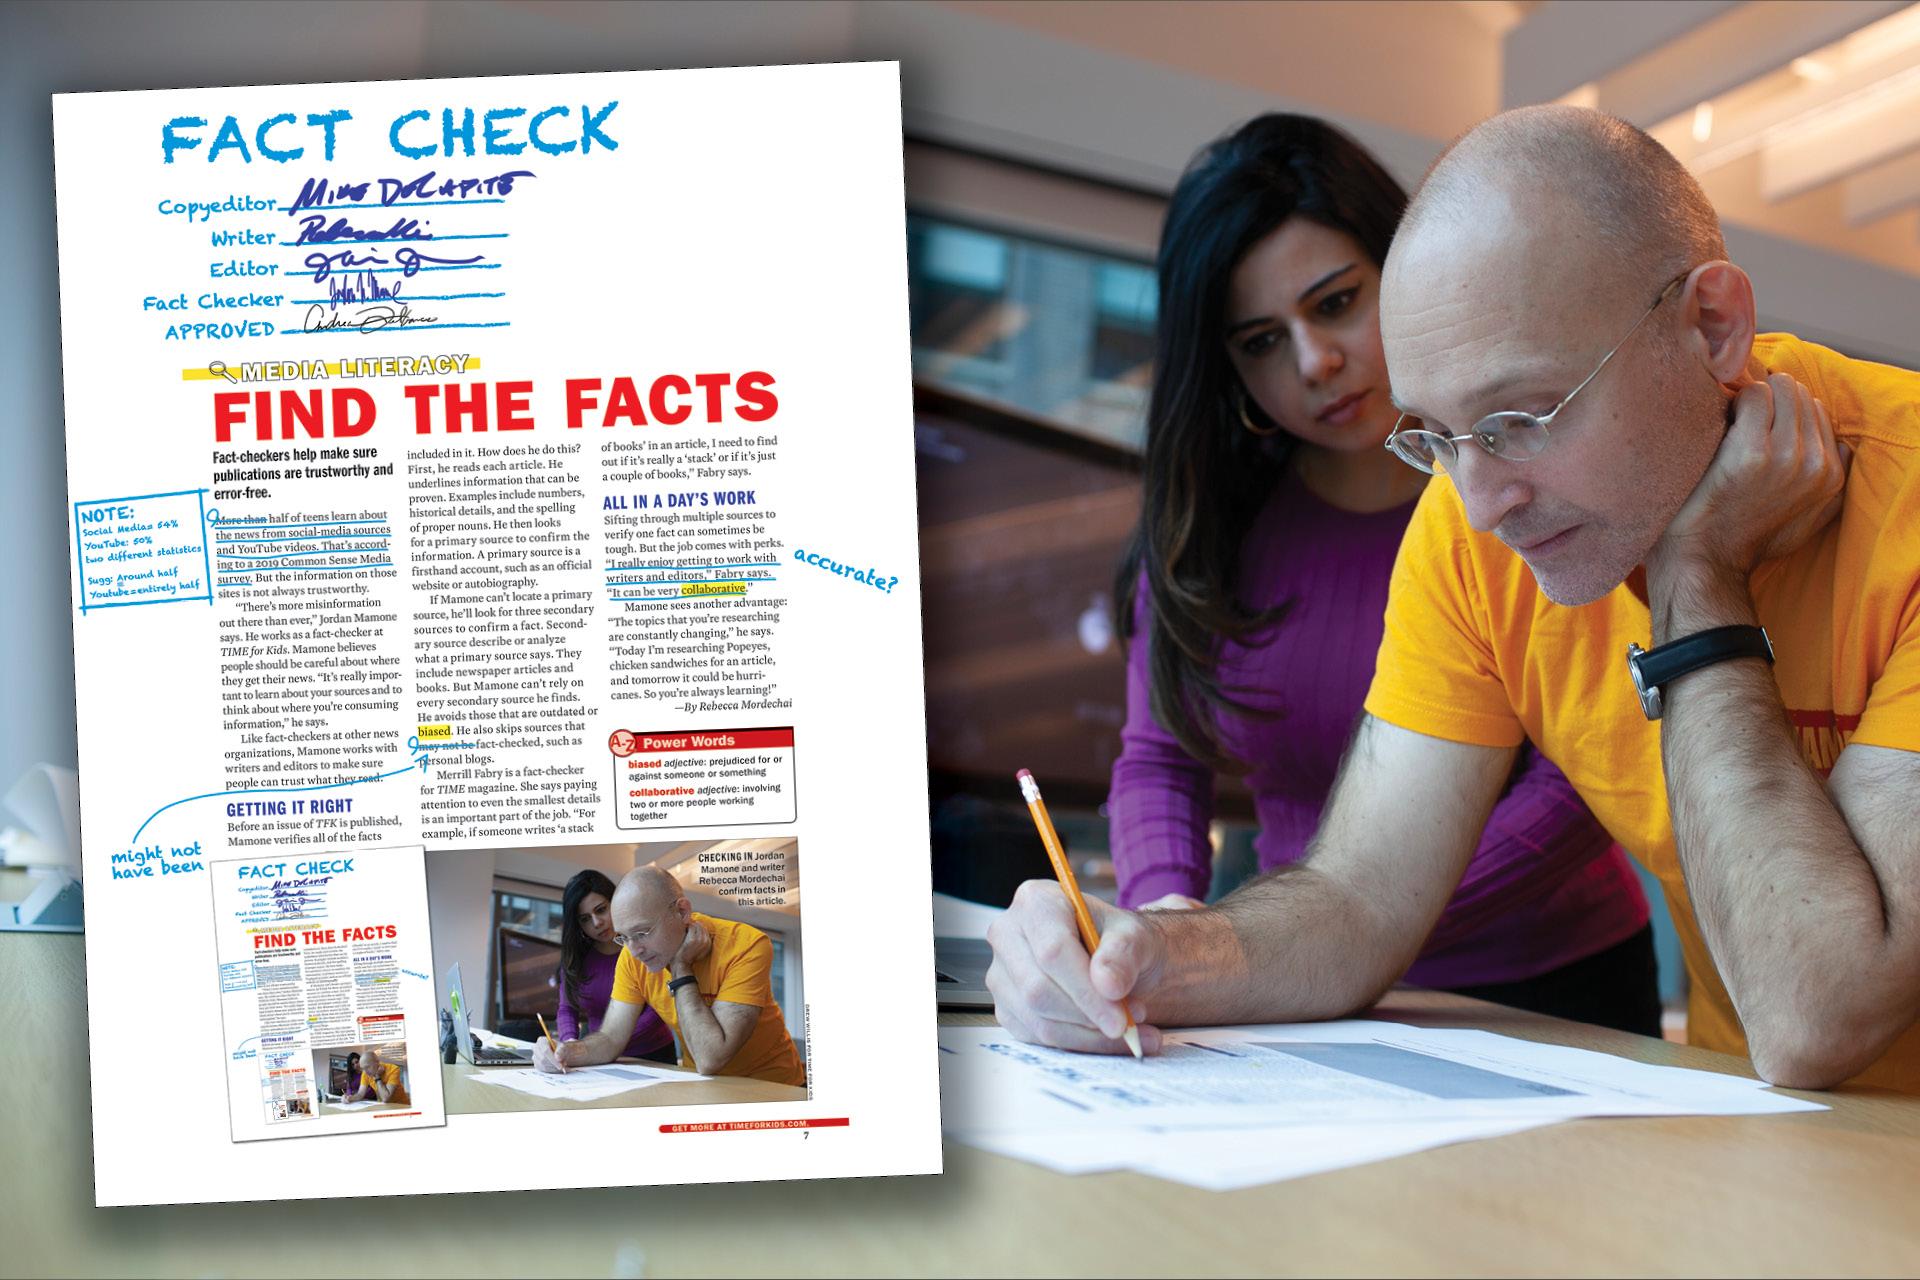 a magazine fact-checker reading a magazine article